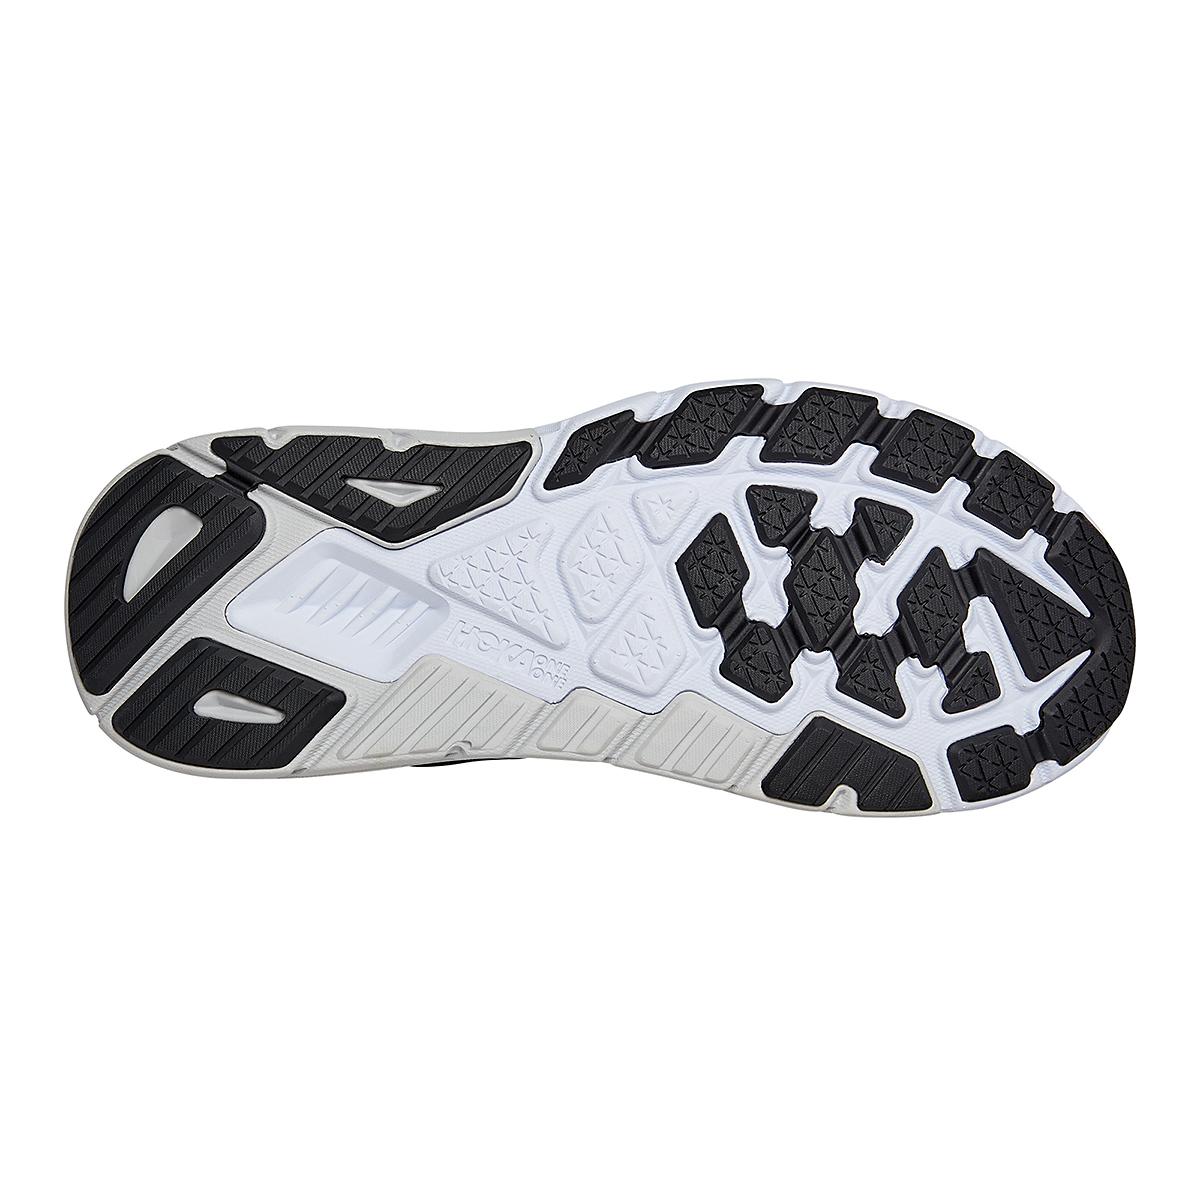 Men's Hoka One One Arahi 5 Running Shoe - Color: Black/White - Size: 7 - Width: Regular, Black/White, large, image 6